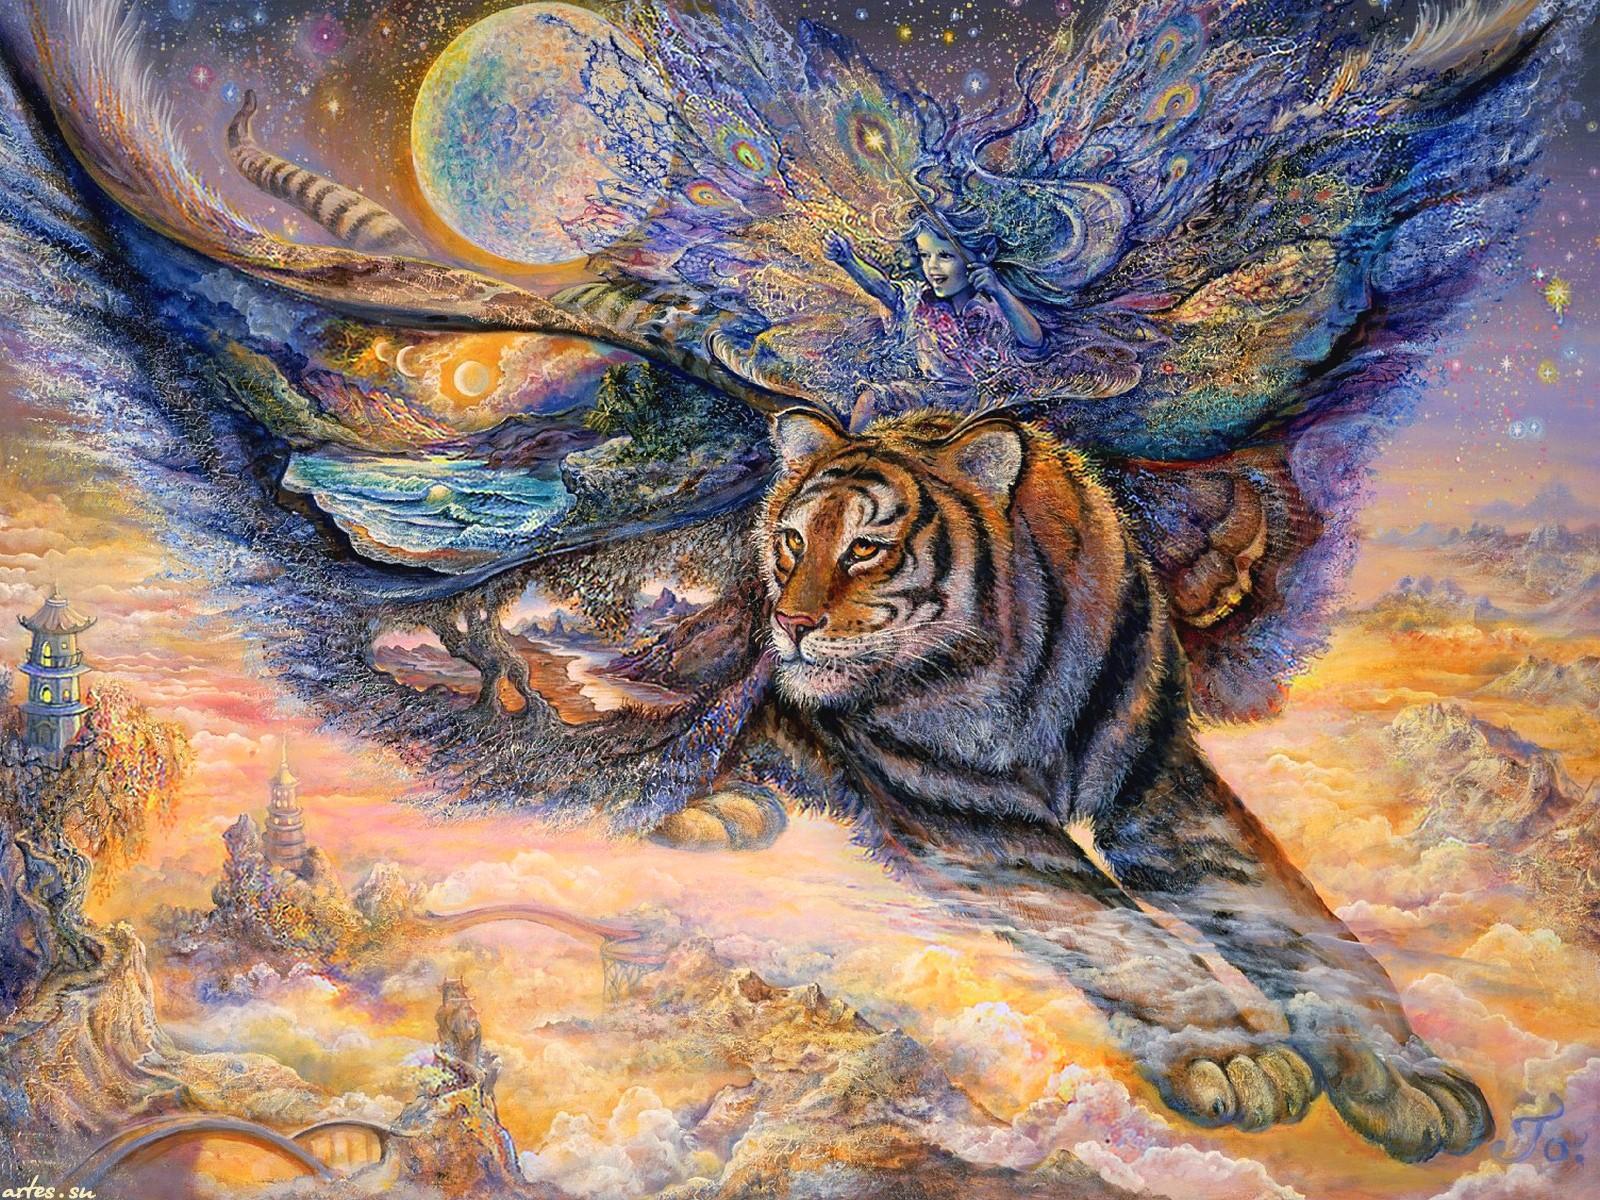 Artistic Fairy Fantasy Flying Tiger 1600x1200